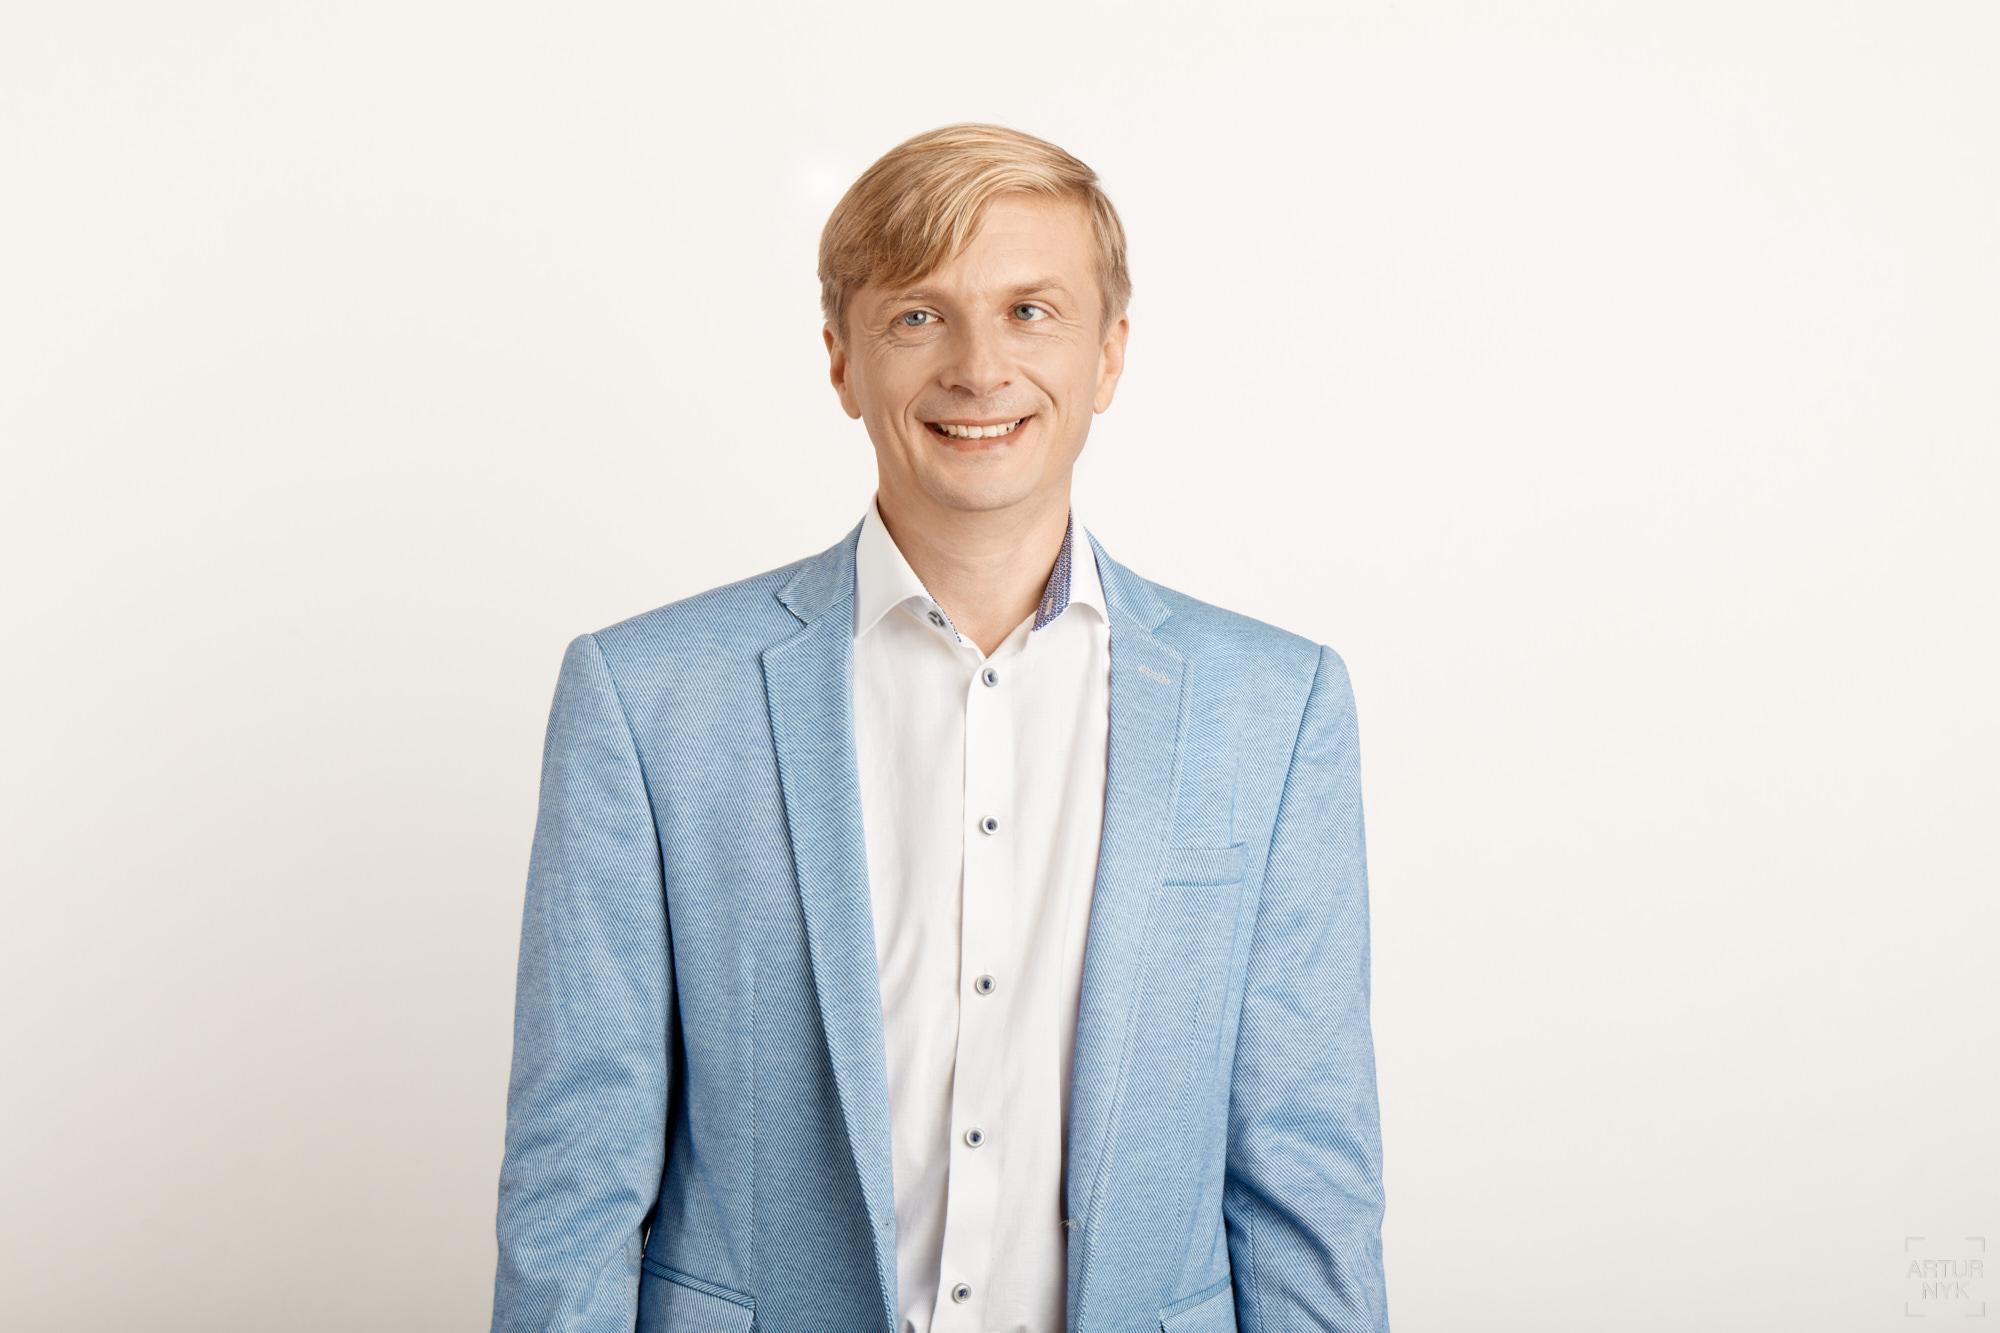 dr Marek Wasiluk, MSc of Aesthetic Medicine, MBA